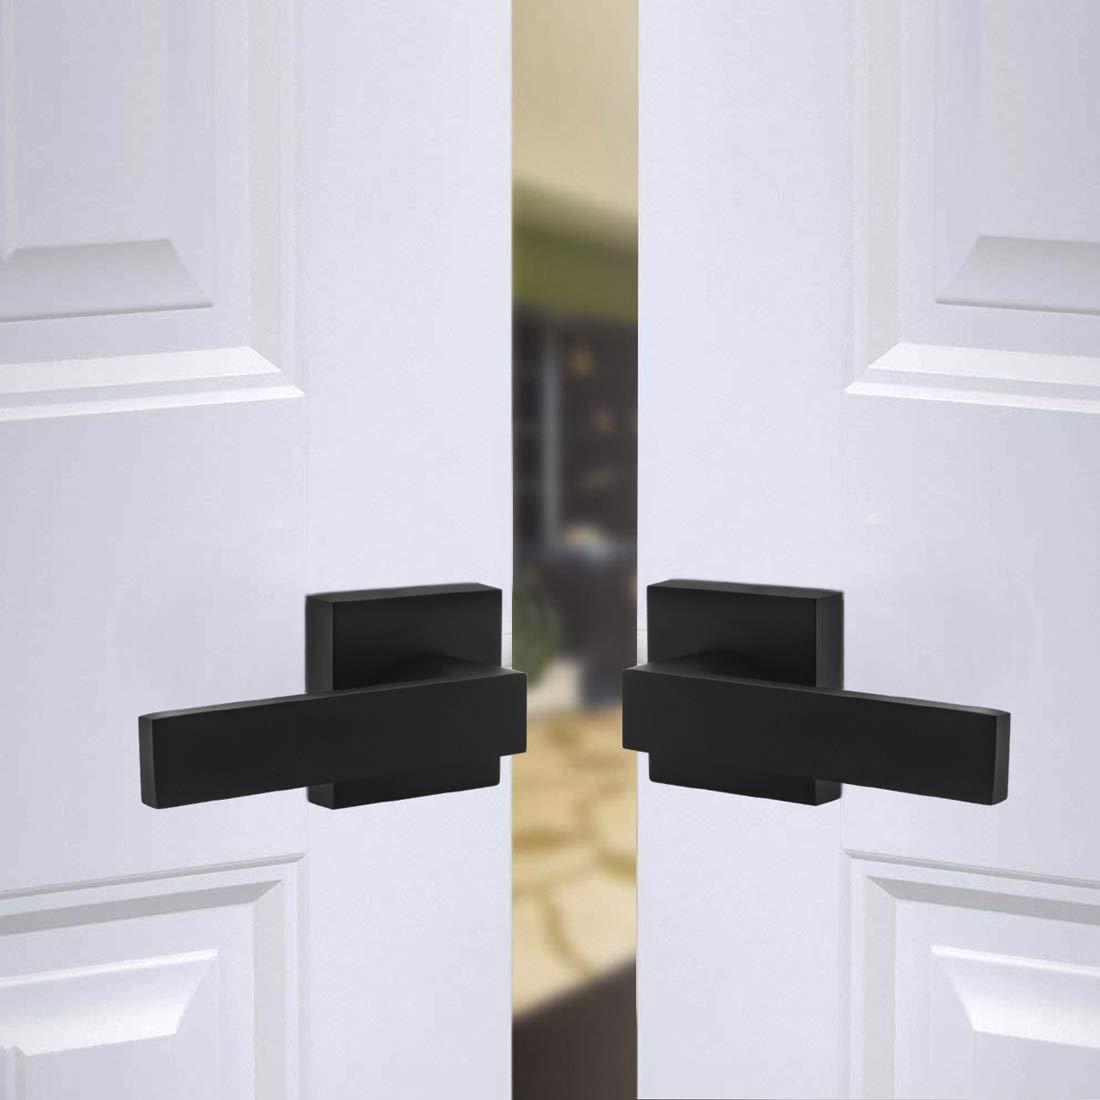 Probrico half-dummy puerta pomo para puerta Interior negro puerta Hardware negro